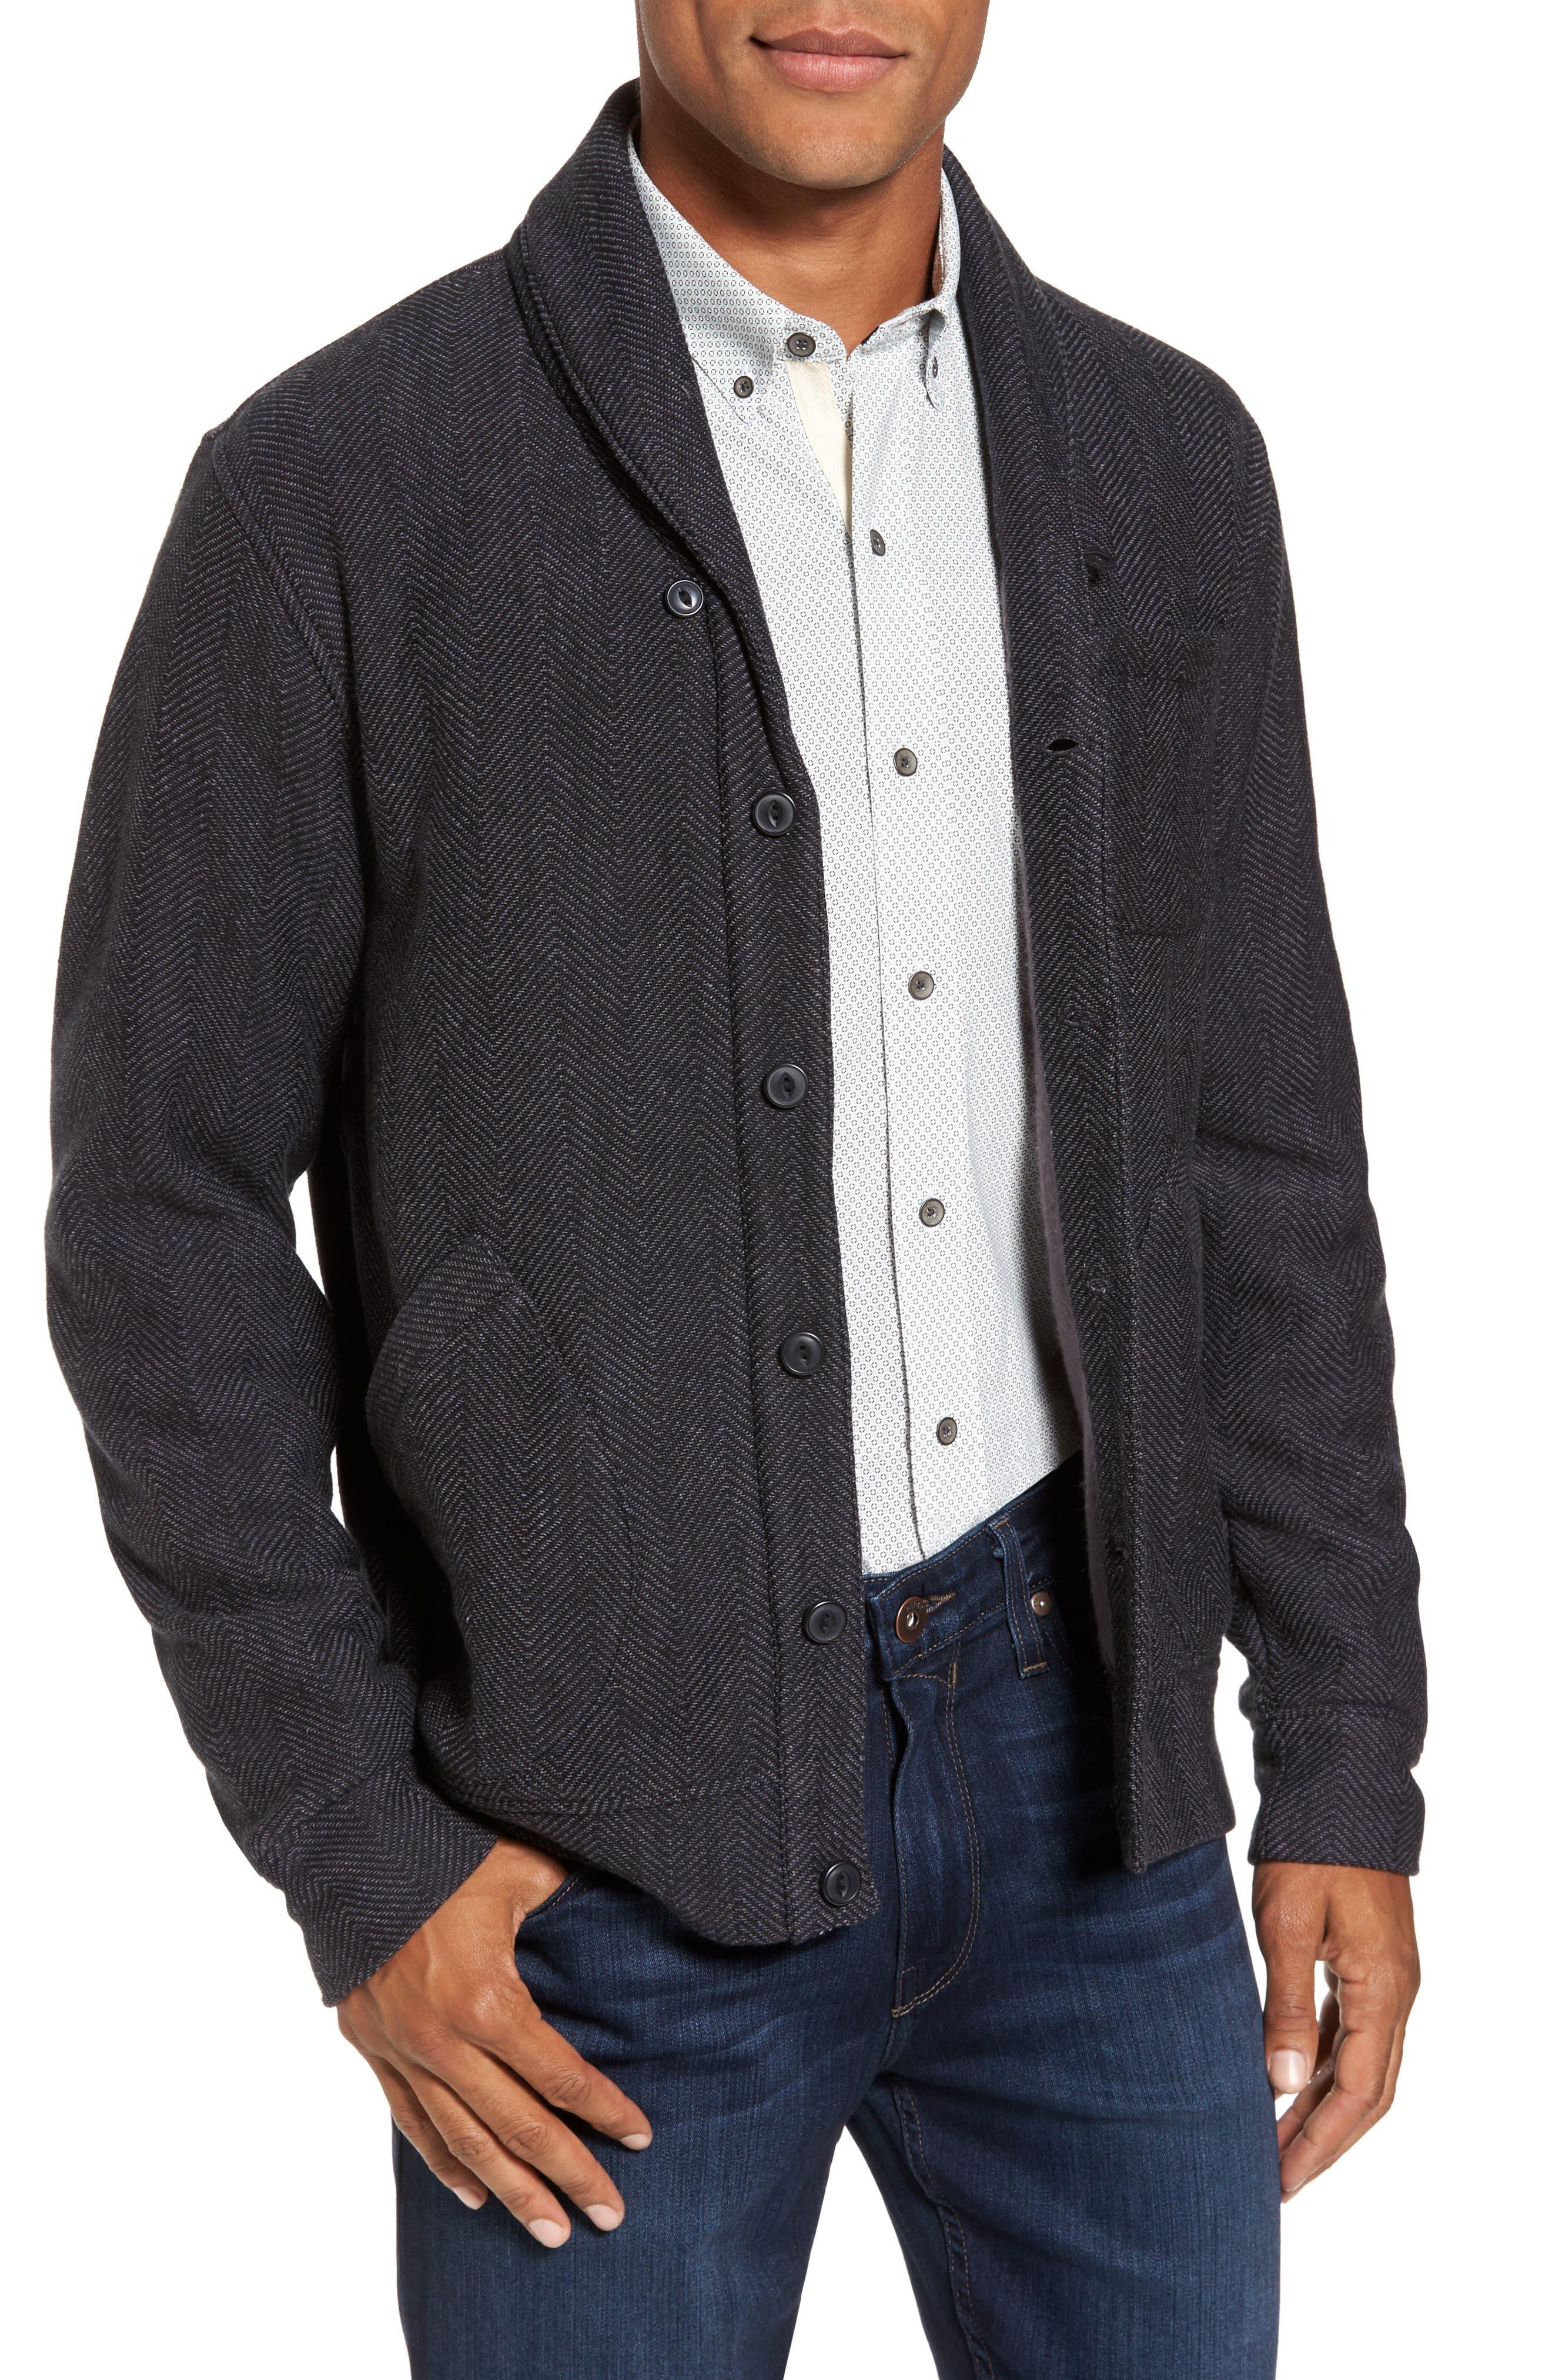 Fleece Lined Shawl Collar Cardigan,                             Main thumbnail 1, color,                             021